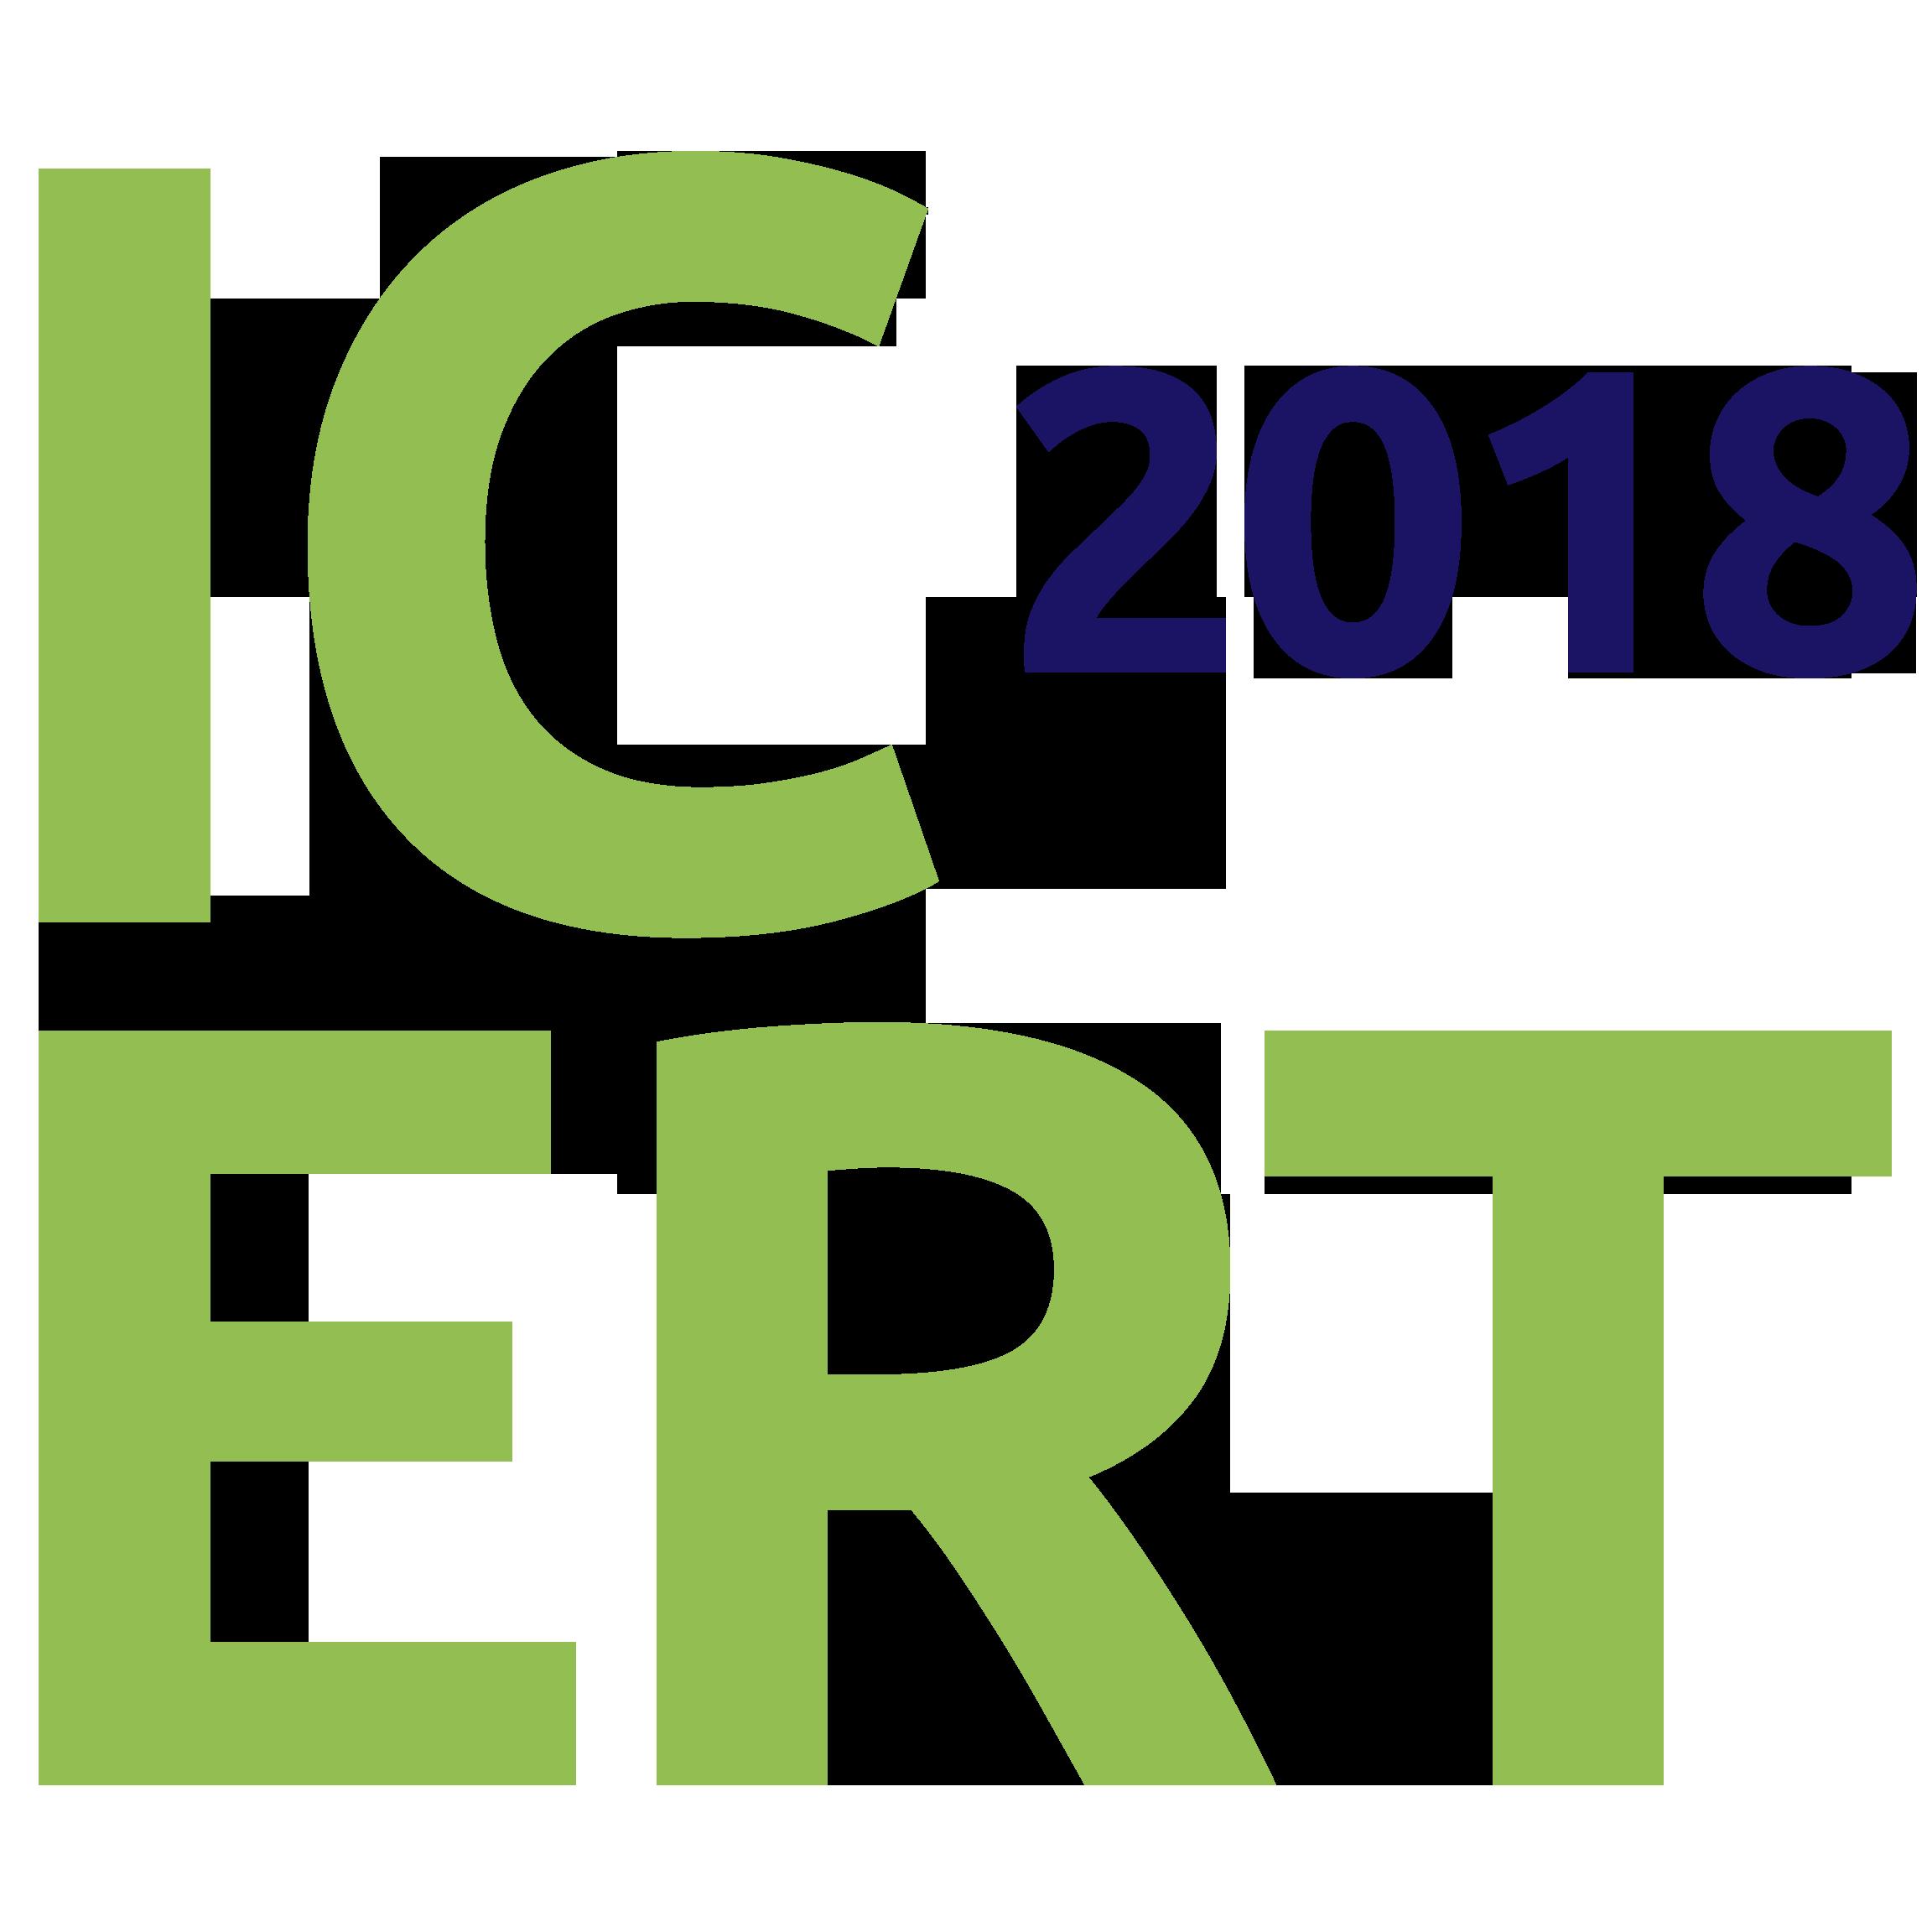 Icert keynote speakers nd. Conference clipart guest speaker